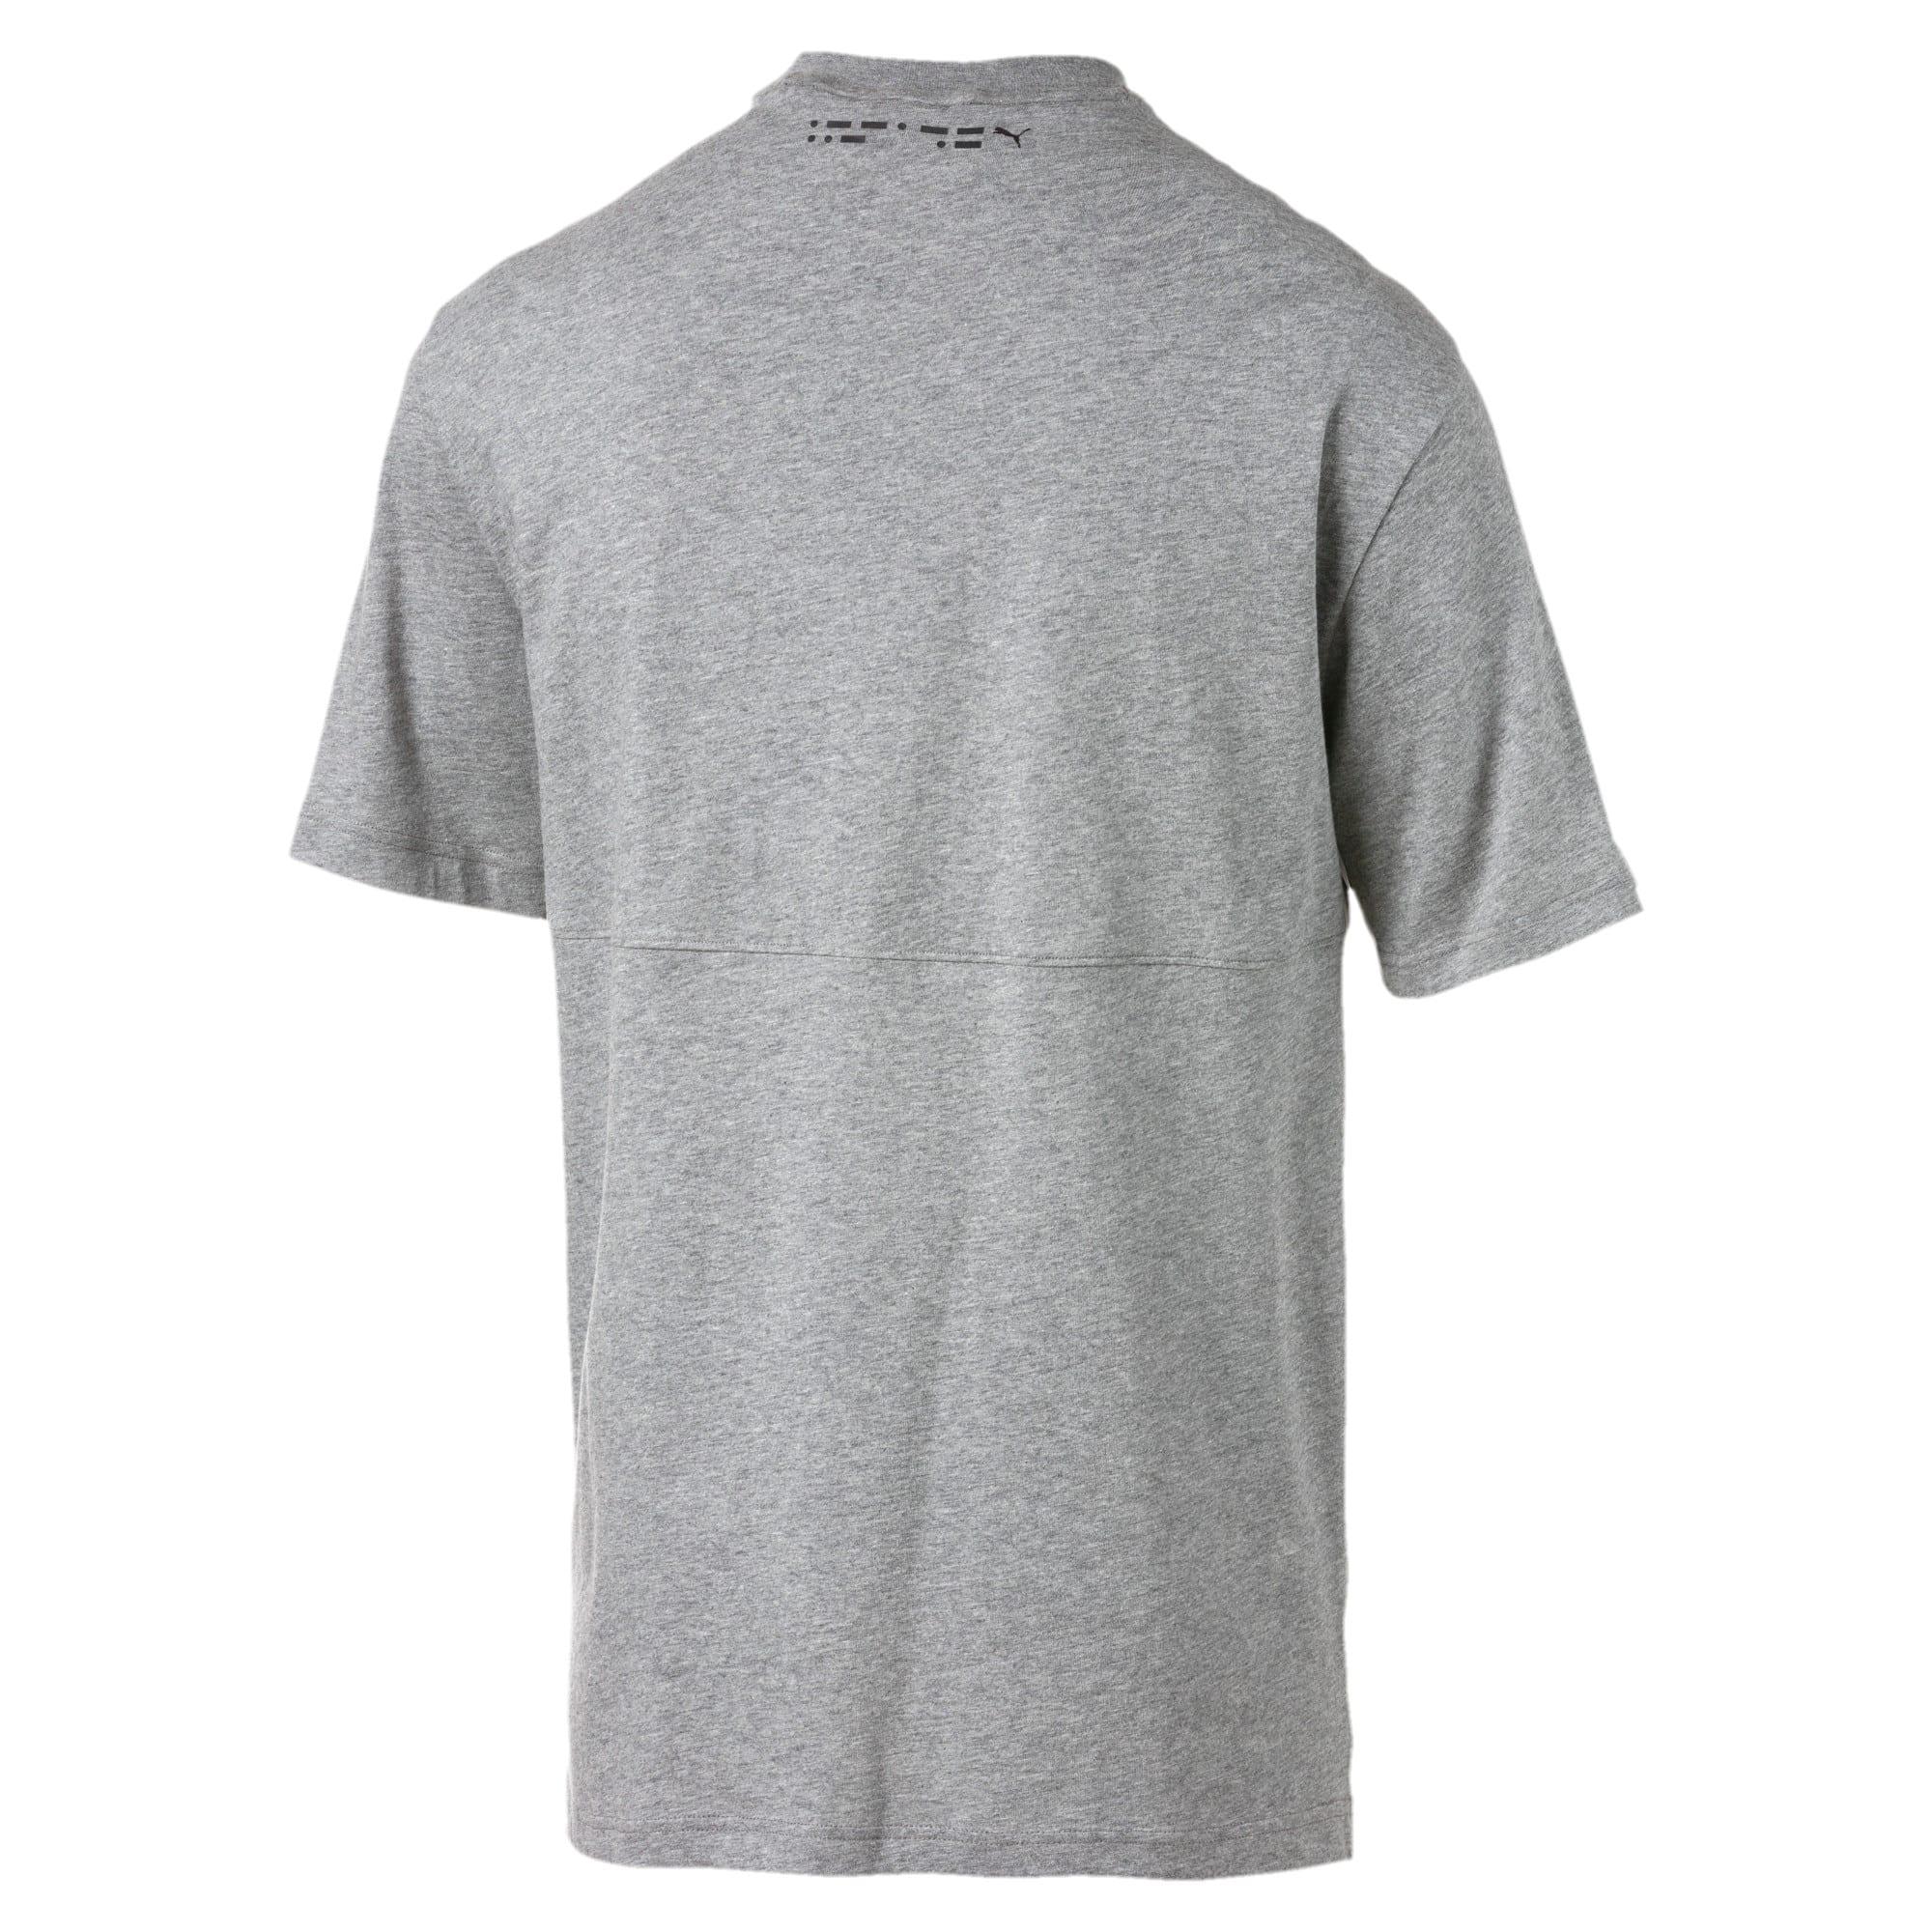 Thumbnail 5 of T-Shirt Epoch pour homme, Medium Gray Heather, medium